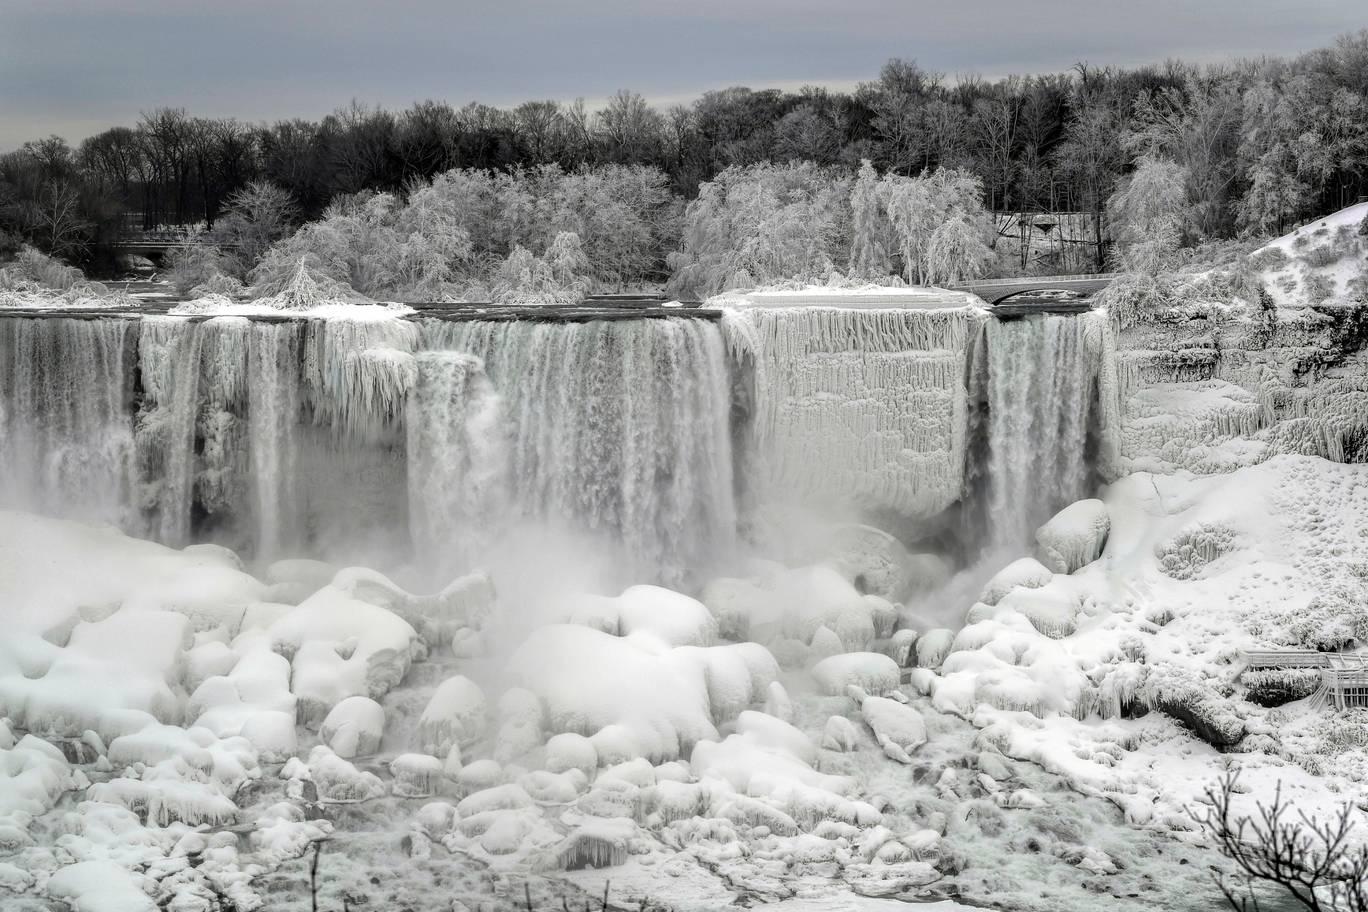 Niagara Falls Frozen Wallpaper 4k Frozen Nature Niagara